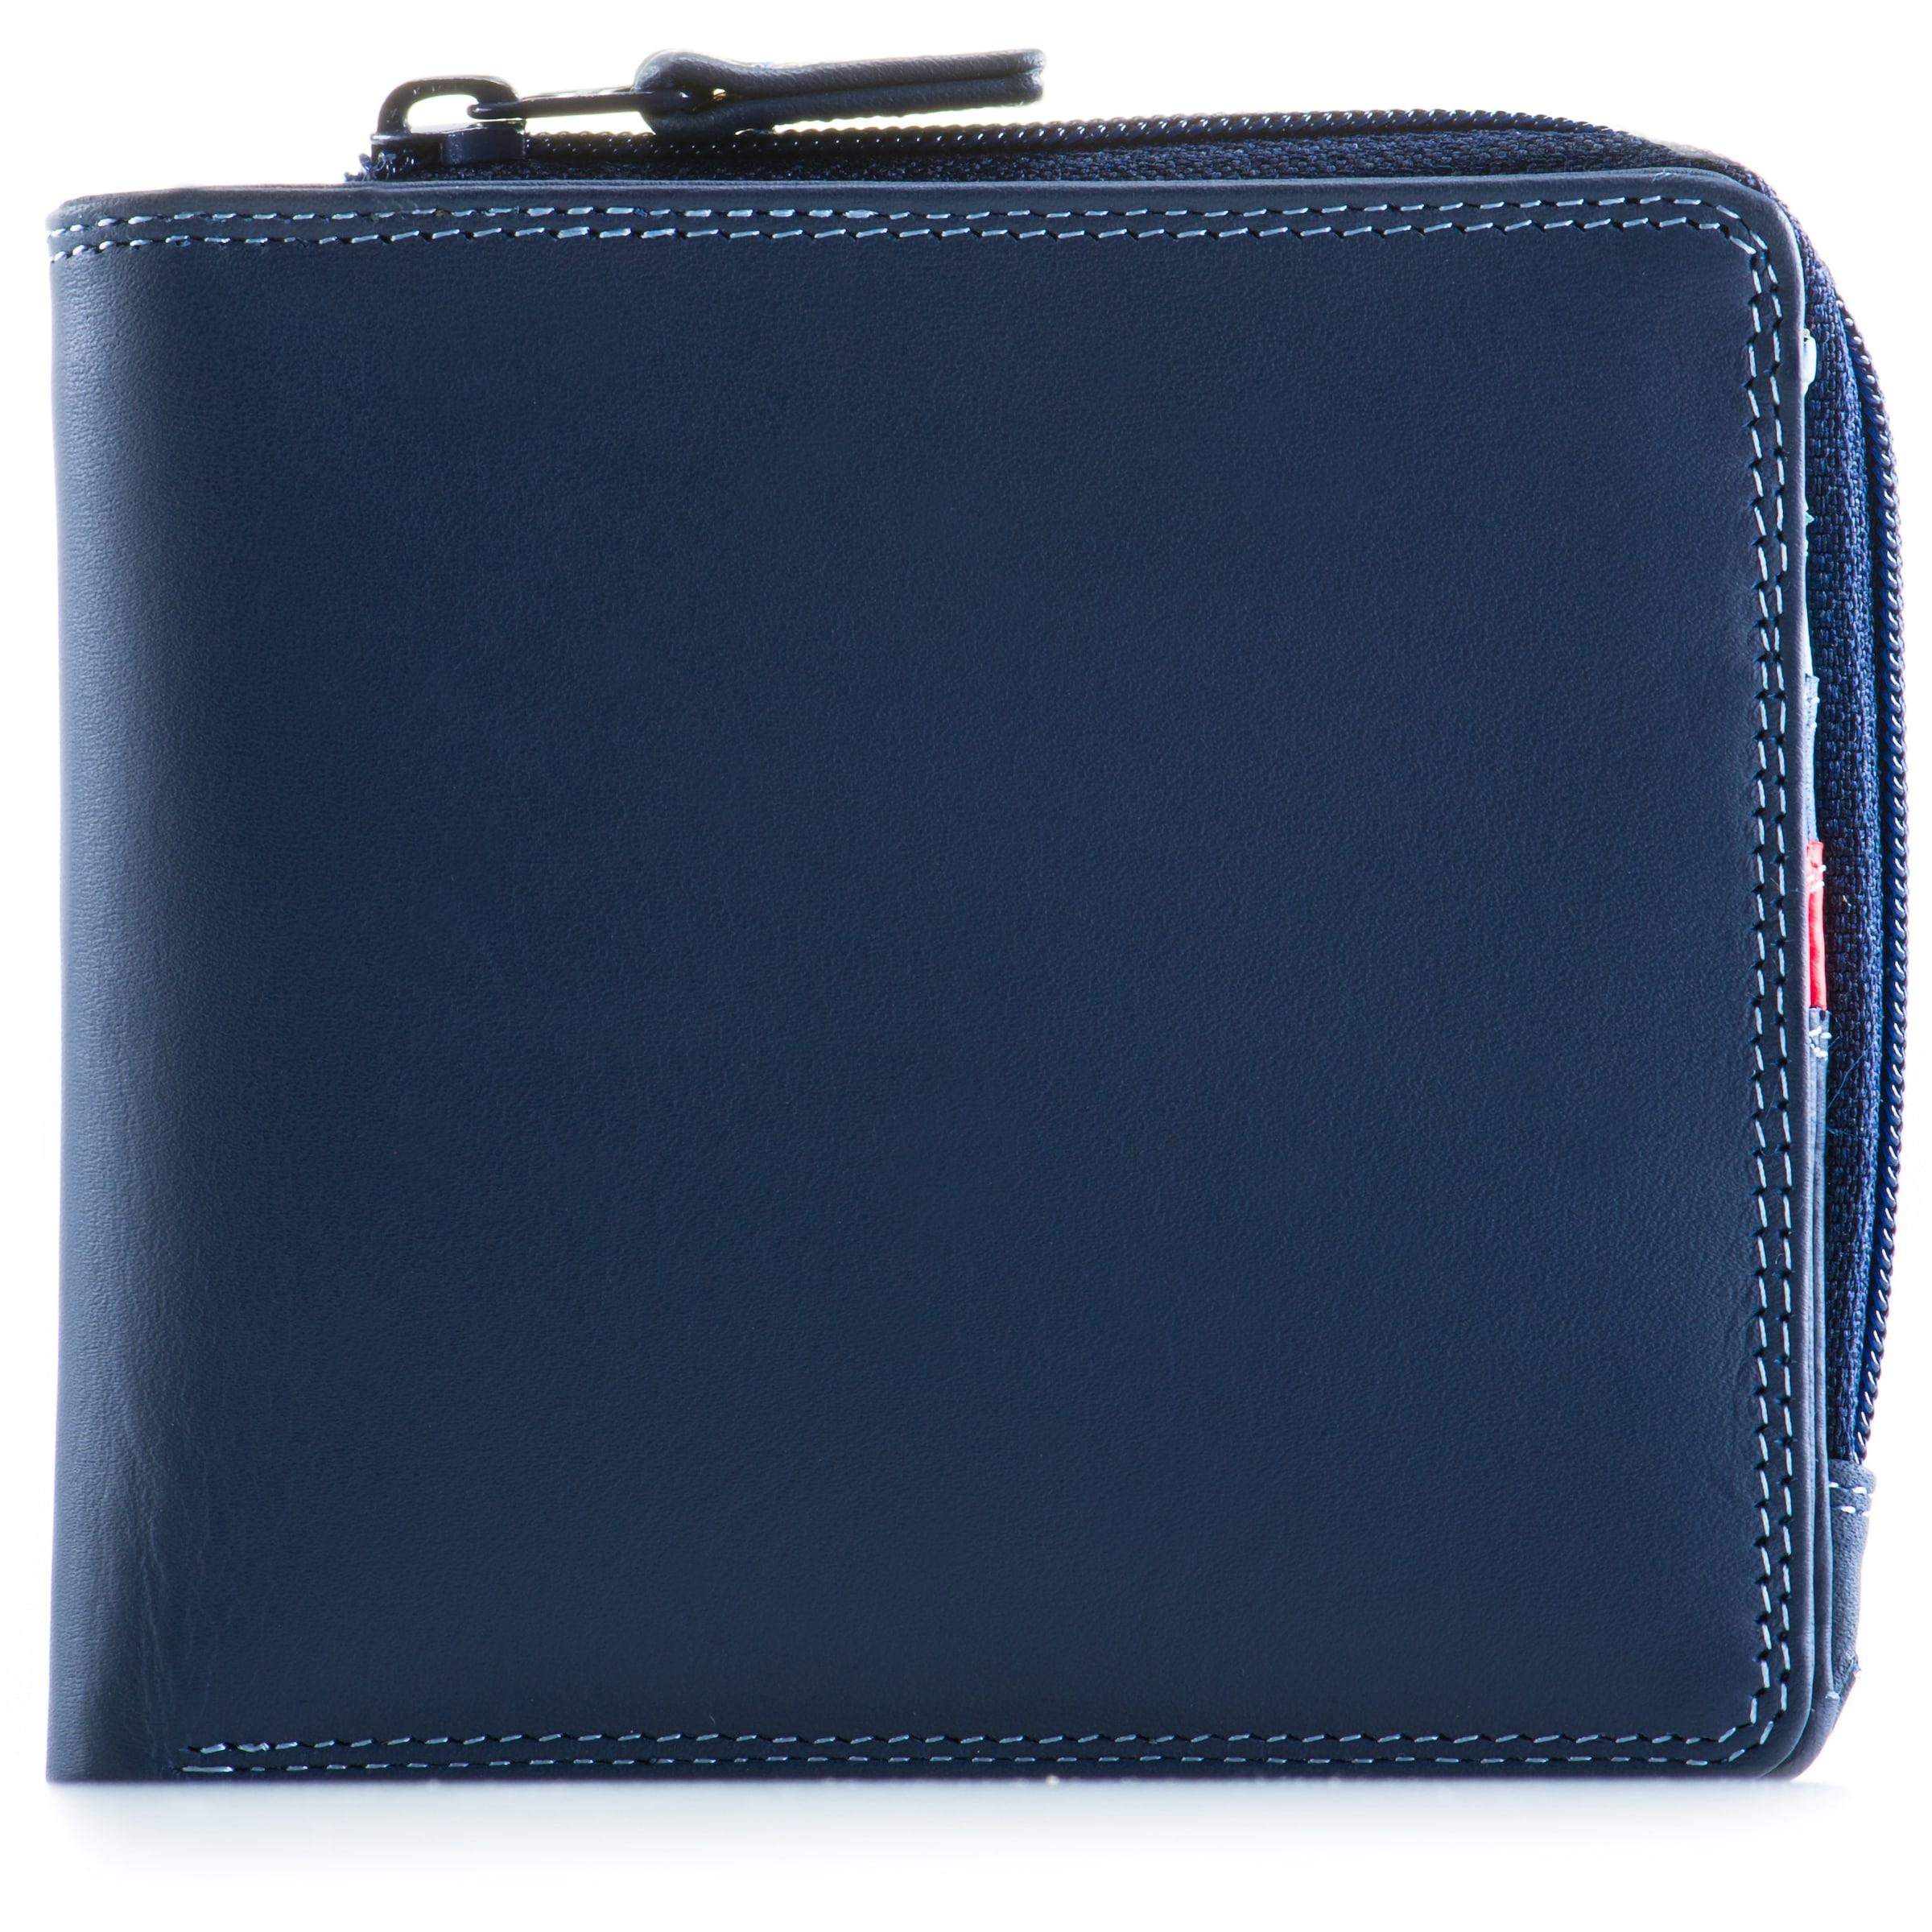 Geldbörse Wallet' 'standard Mywalit Nachtblau In fyb6Yg7